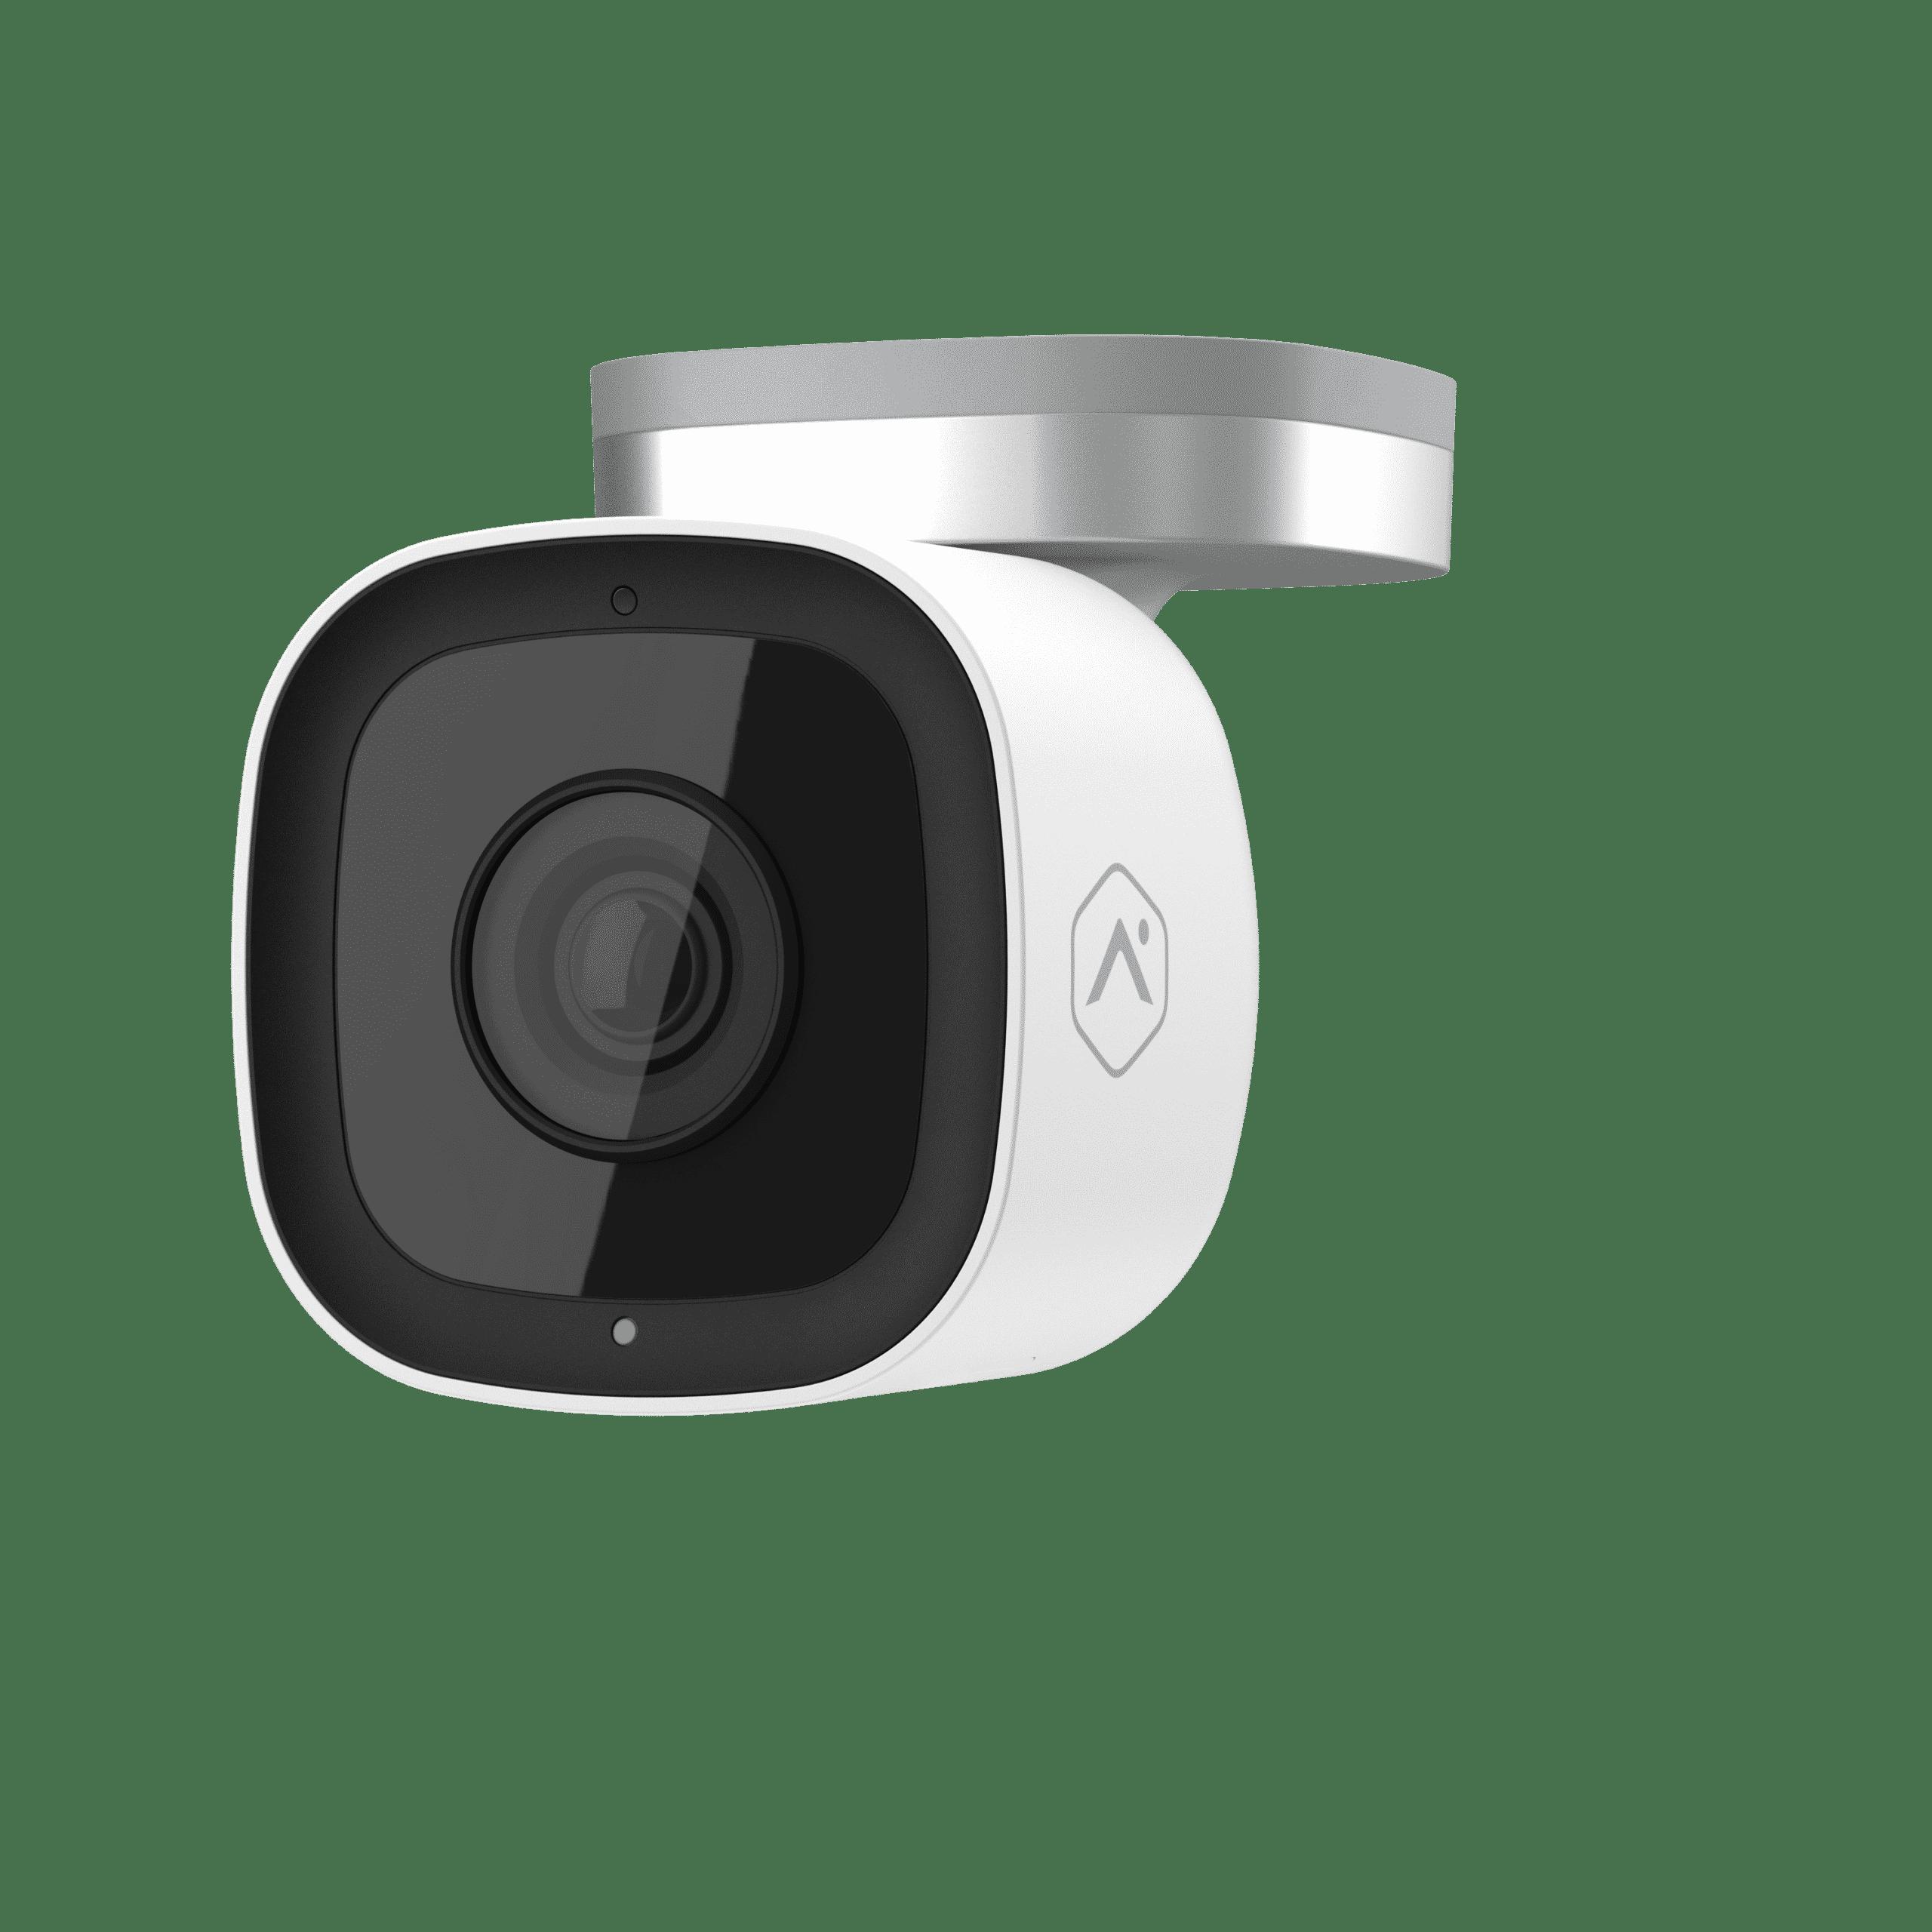 Outdoor Security Camera Frase Protection Memphis